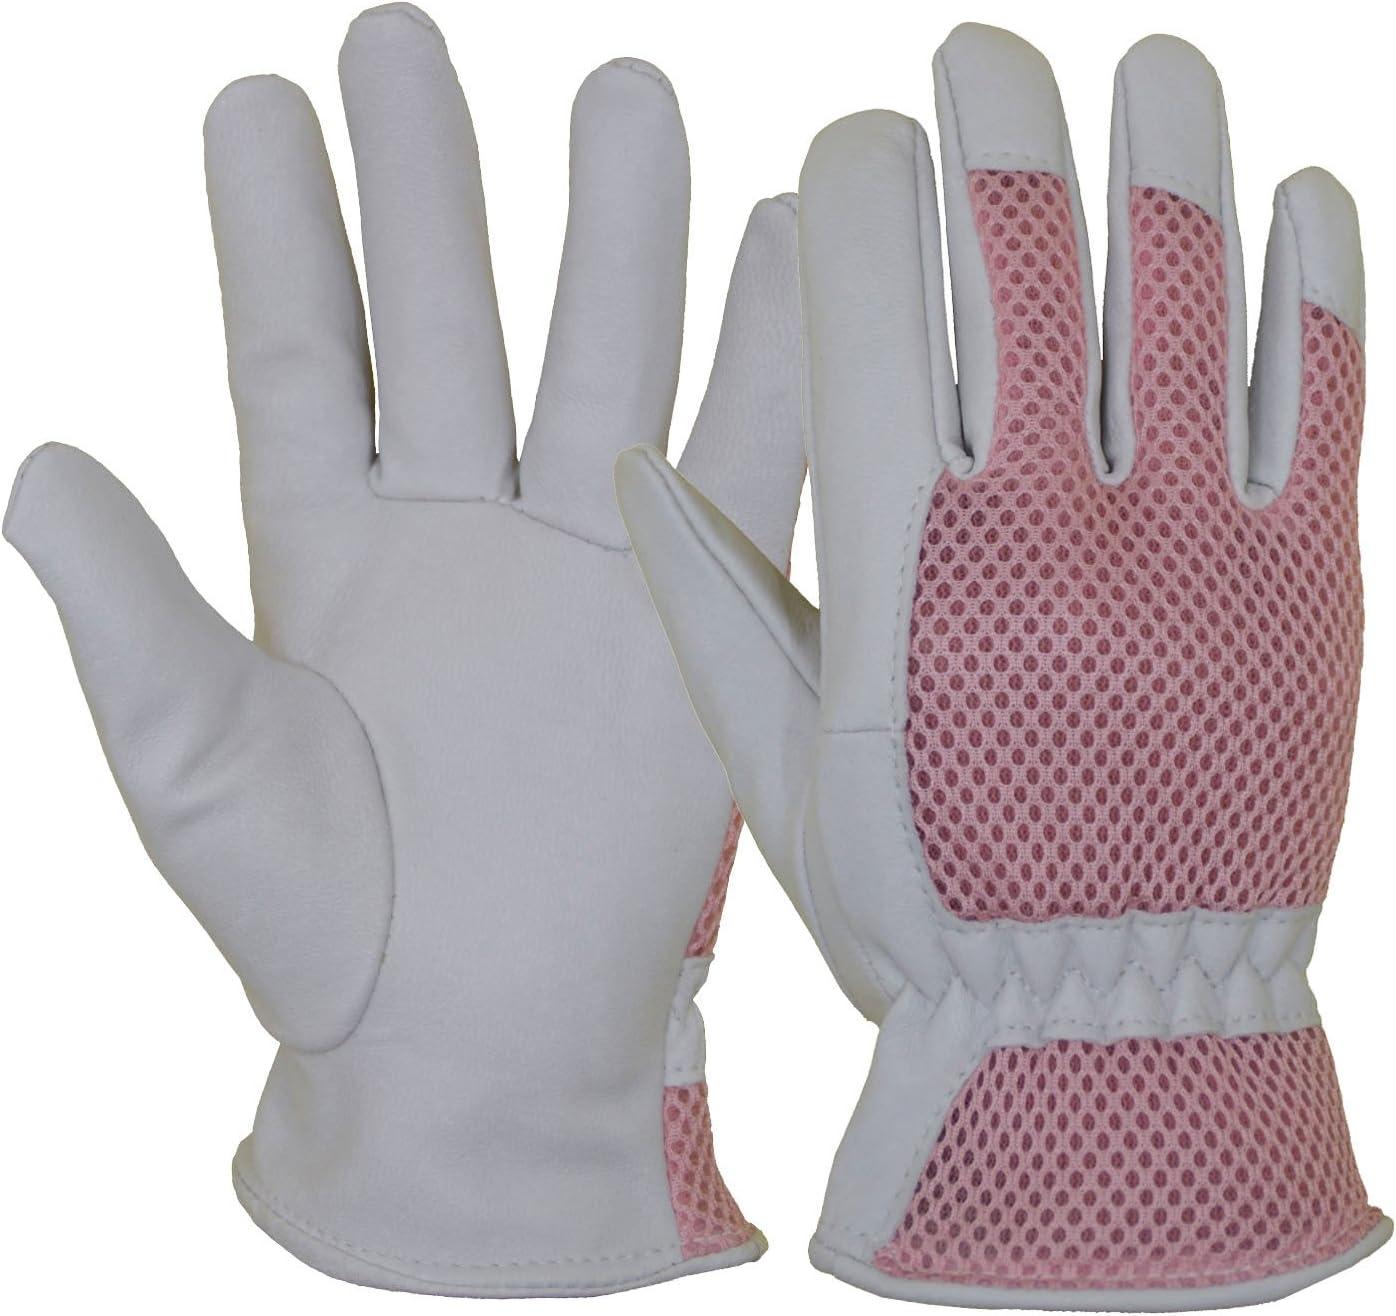 Goatskin Leather Gardening Gloves Women, 3D Mesh Comfort Fit- Improves Dexterity and Breathability Design, Scratch Resistance Ladies Garden Working Gloves for Vegetable